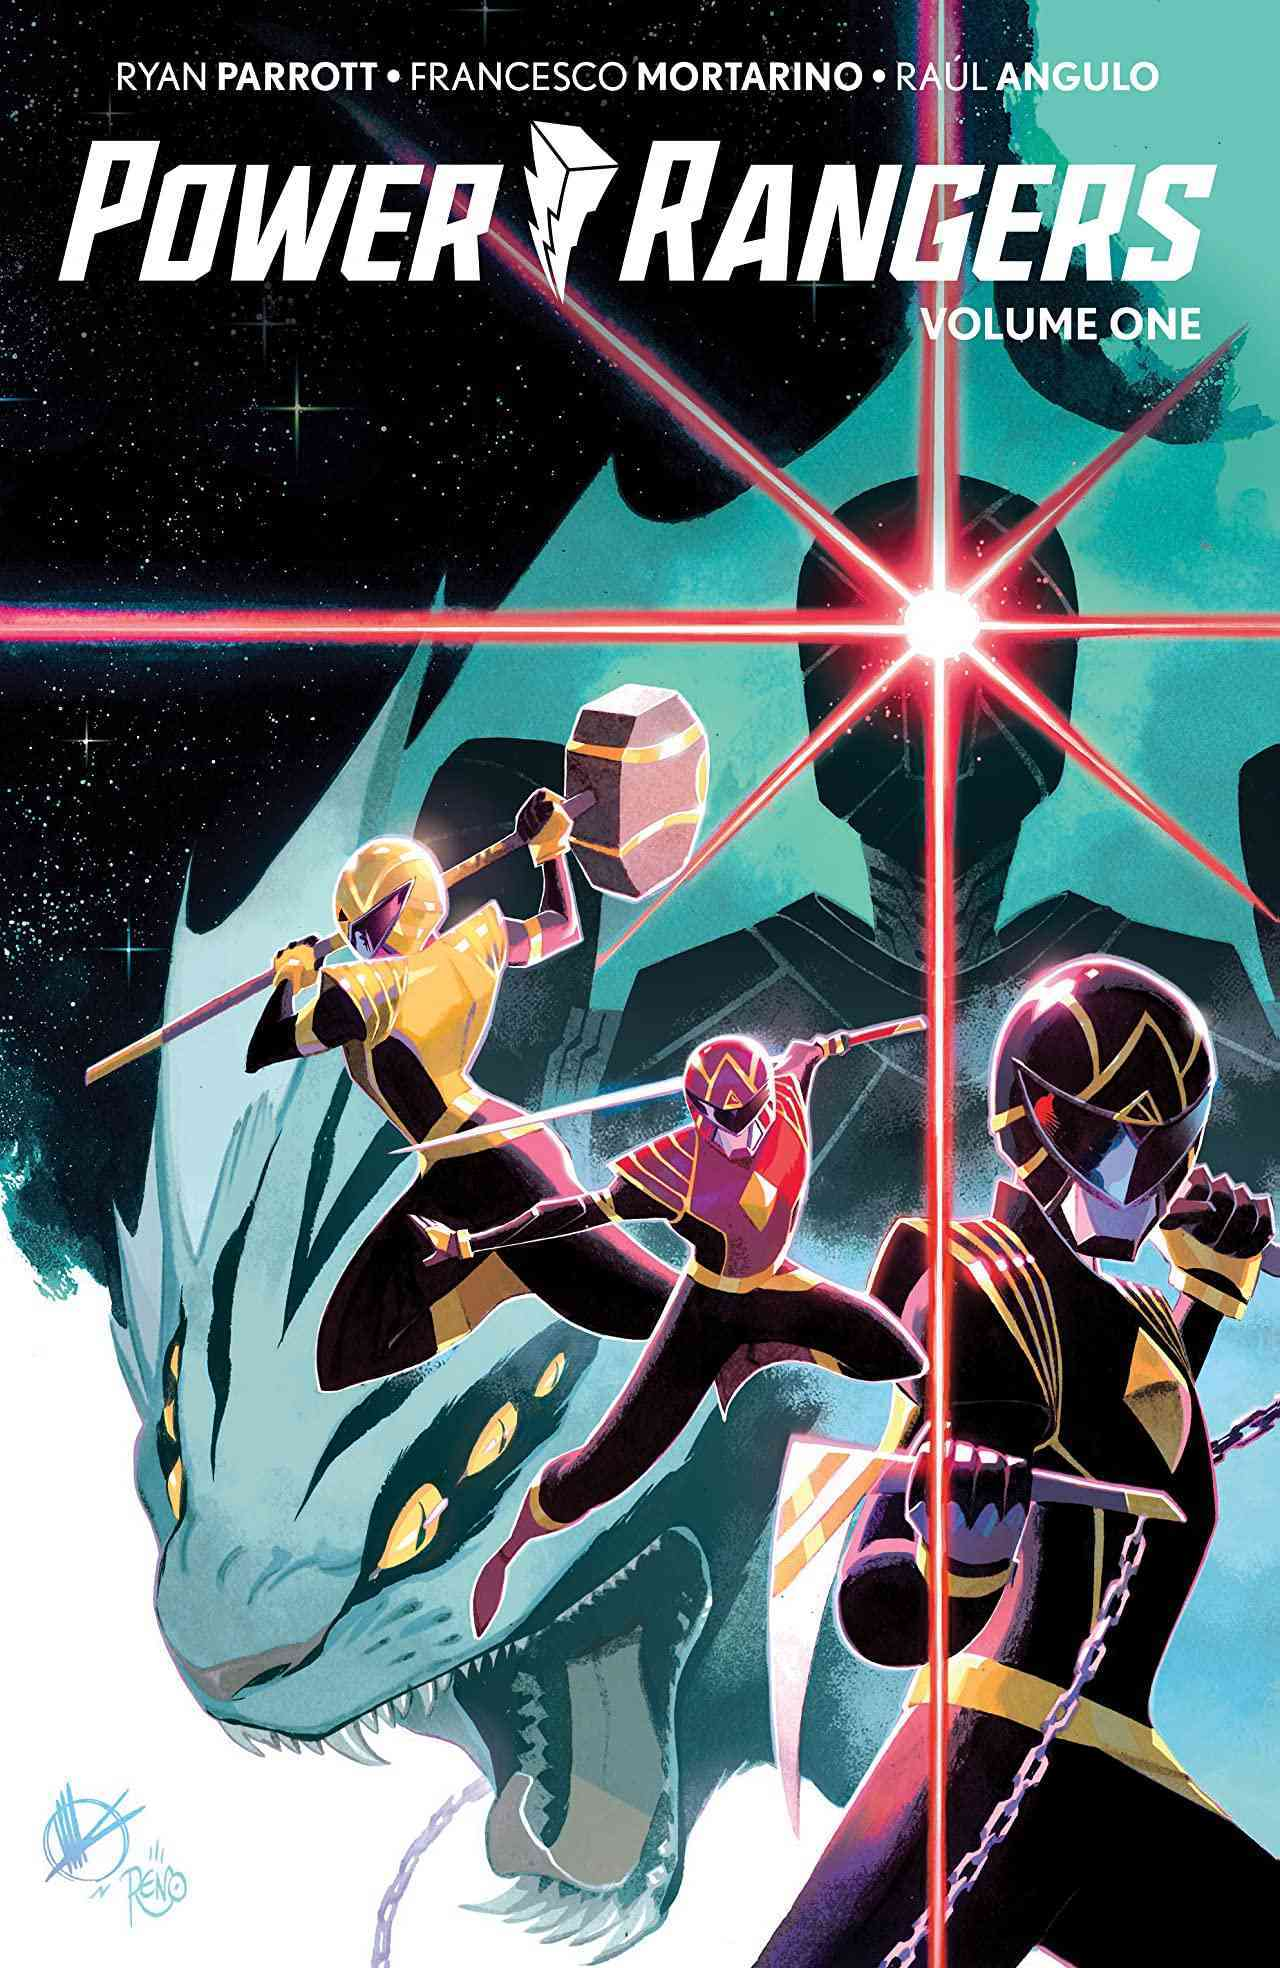 Power Rangers Vol 1